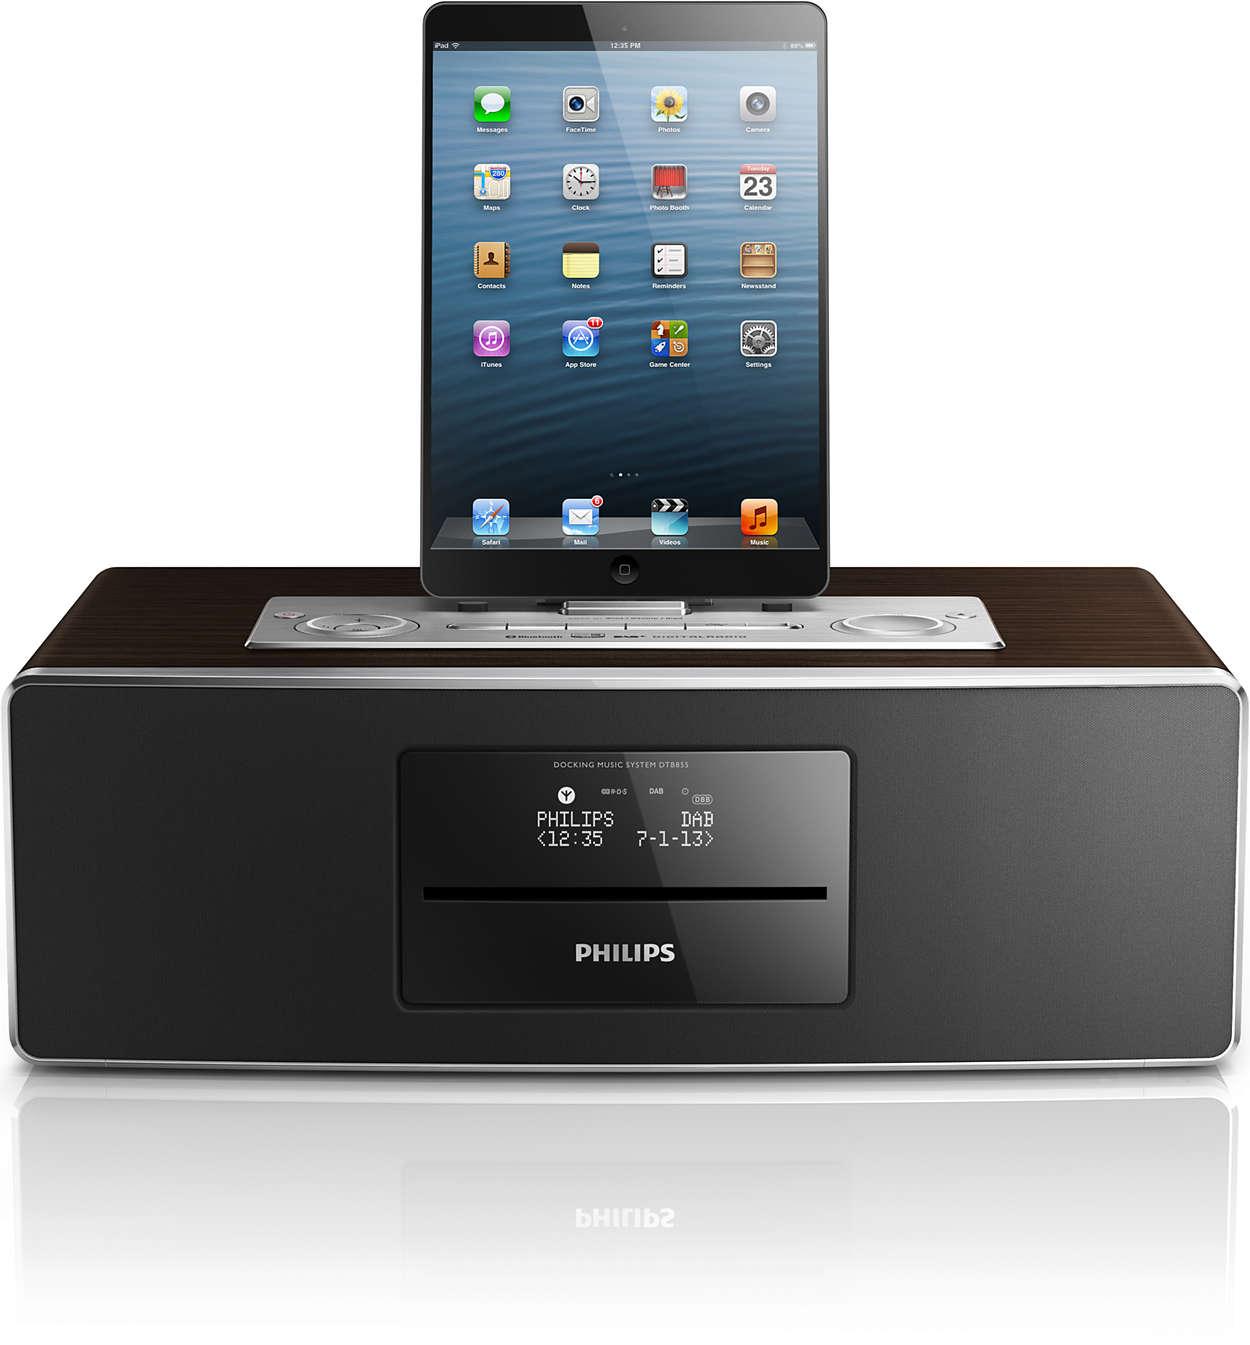 mini stereoanlage dtb855 10 philips. Black Bedroom Furniture Sets. Home Design Ideas